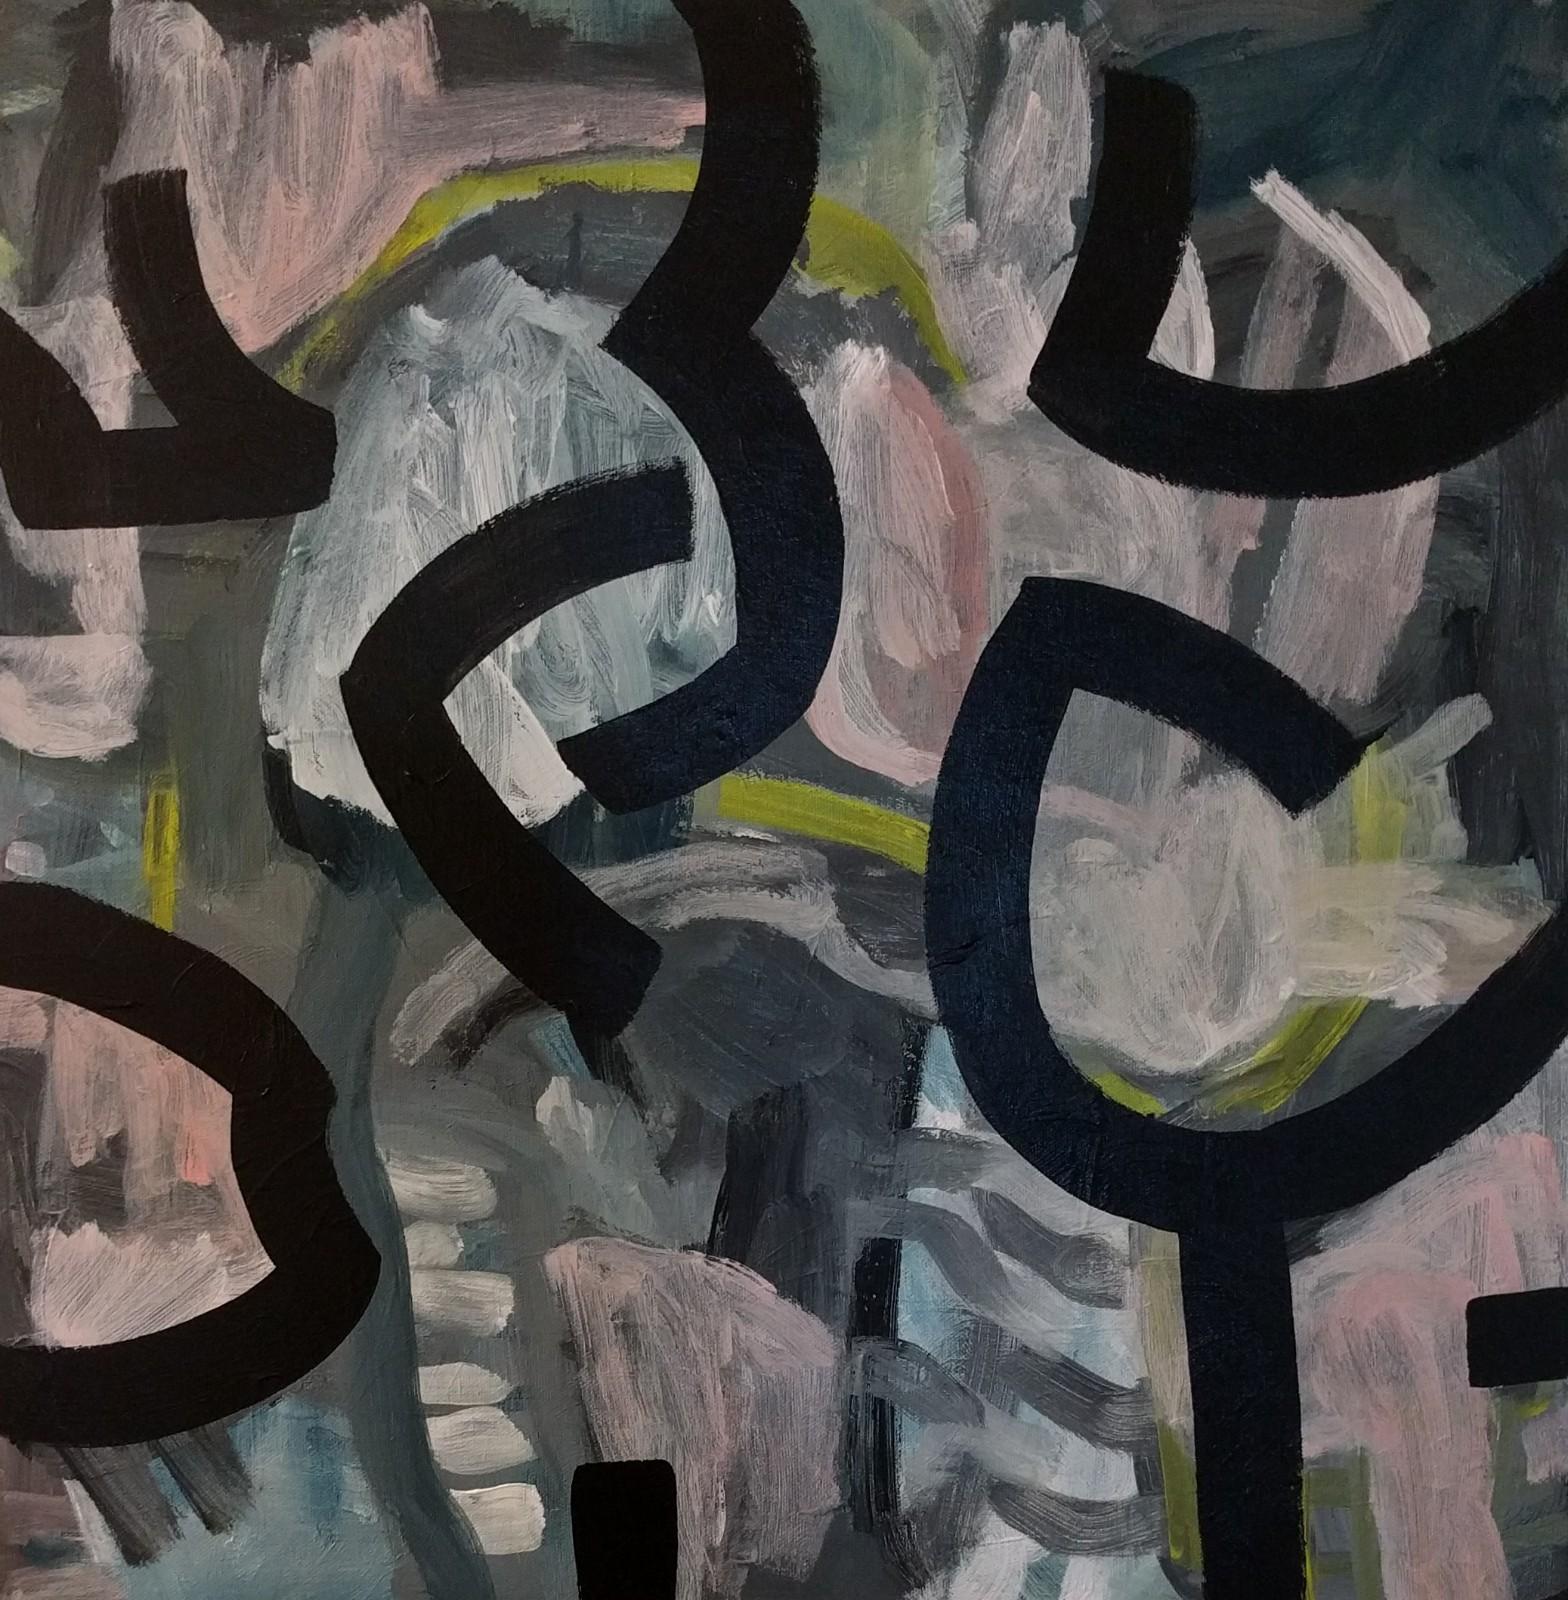 K.ALLISON ART